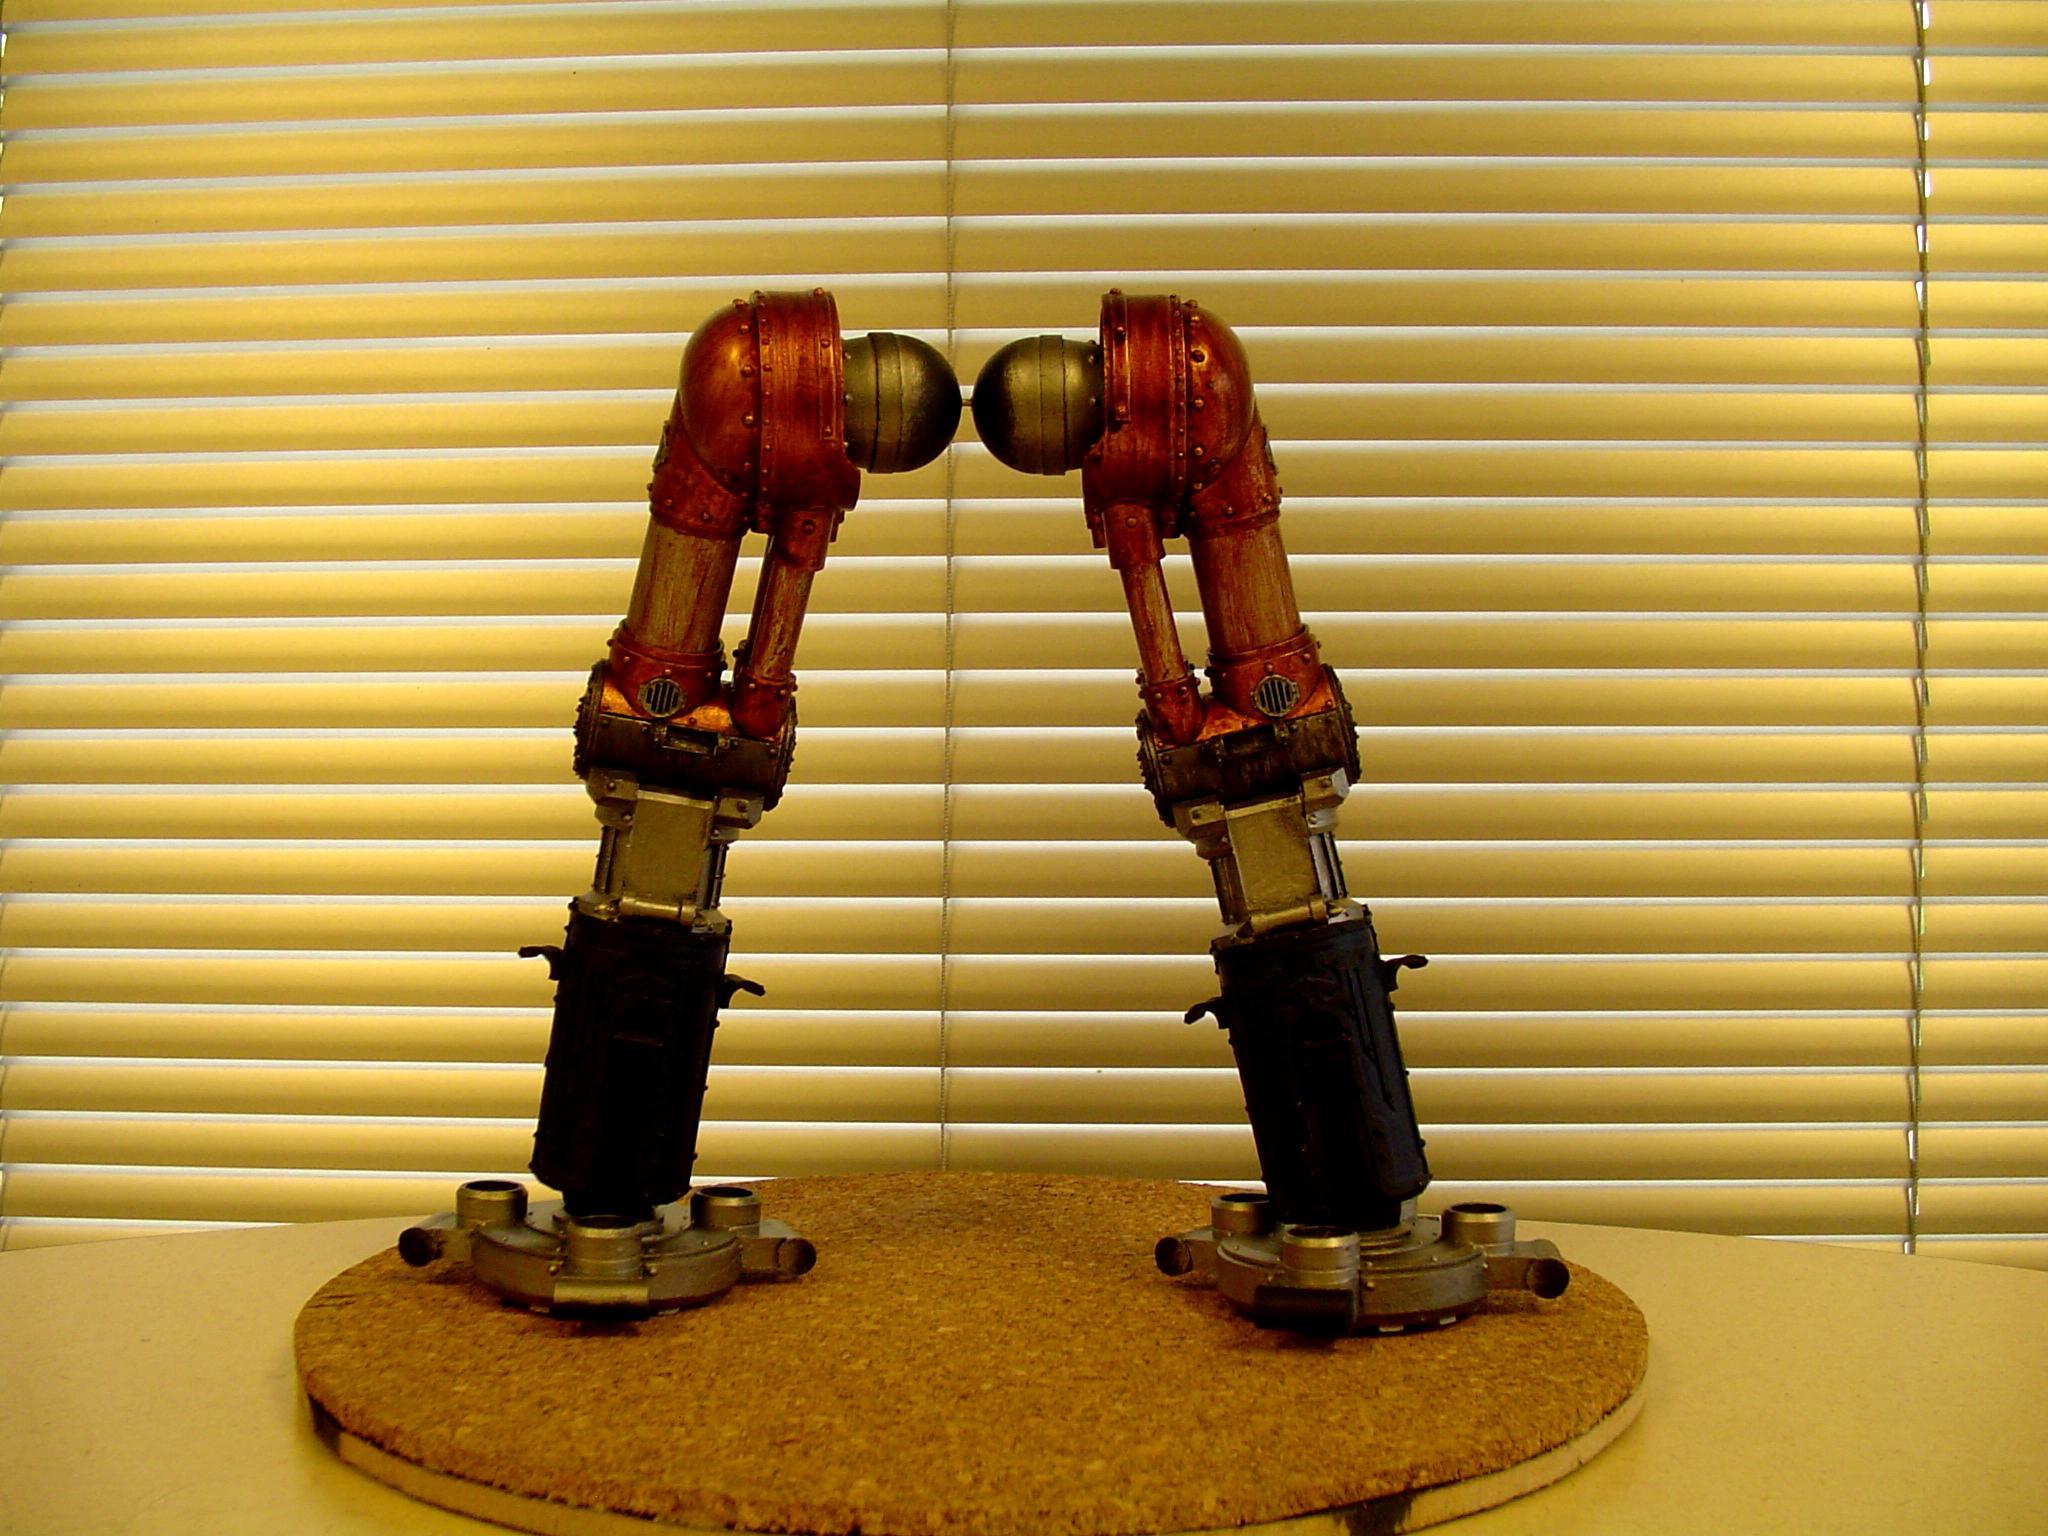 Reaver titan legs and feetr